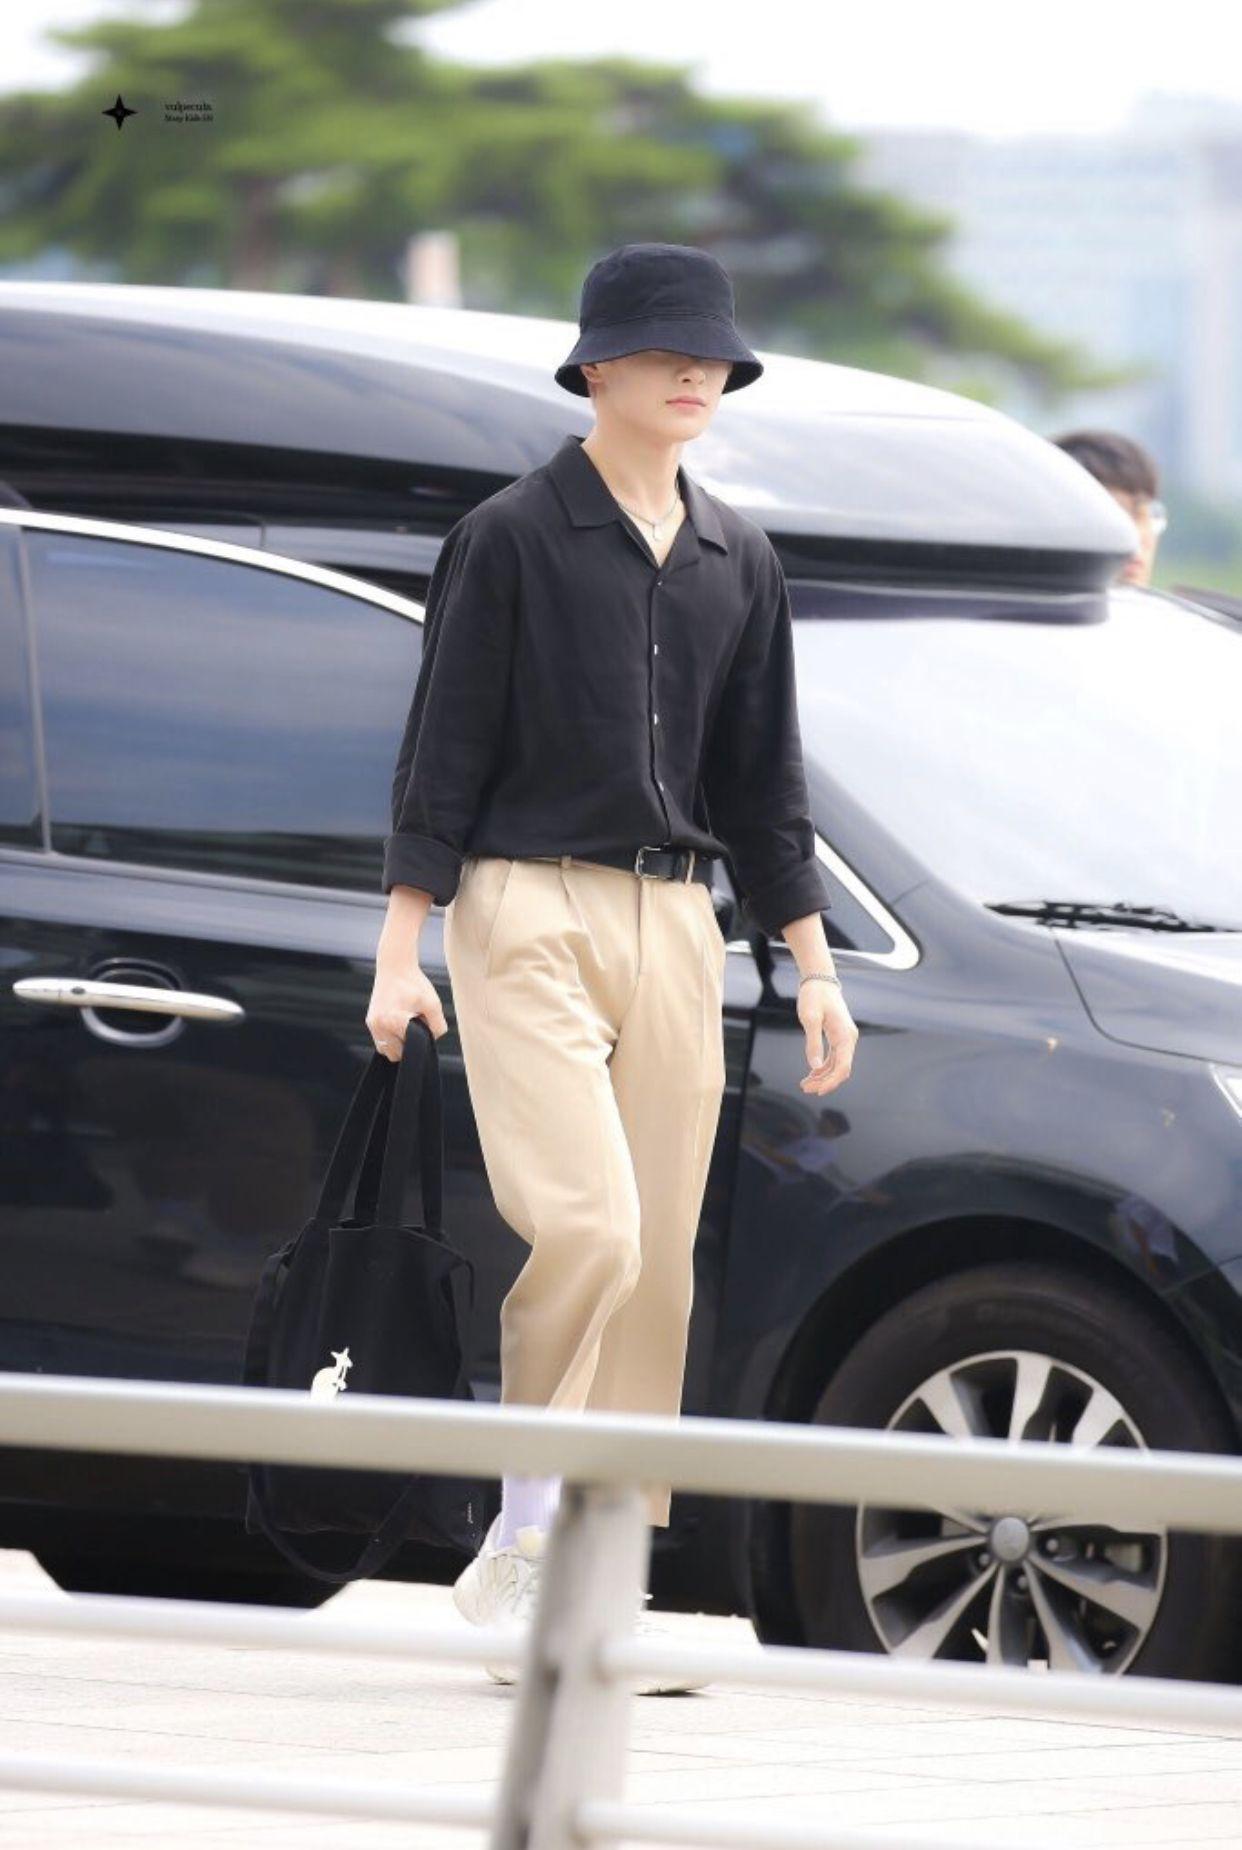 Straykids Yangjeongin Gaya Model Pakaian Korea Gaya Model Pakaian Gaya